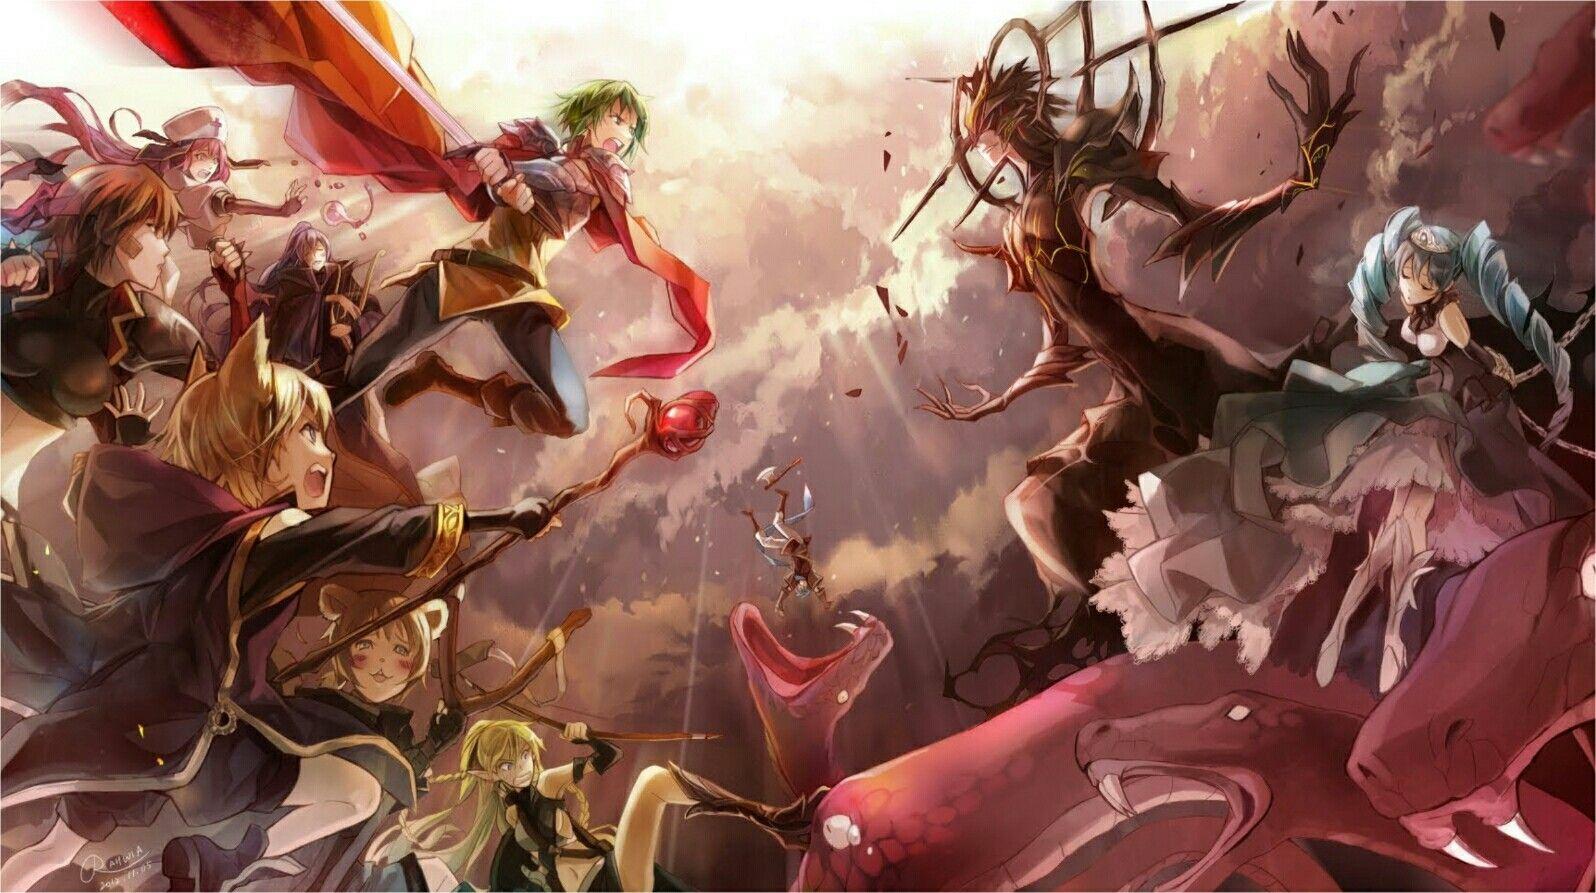 Anime Fight Anime Fight Anime Wallpaper Anime Backgrounds Wallpapers Action anime wallpaper free download